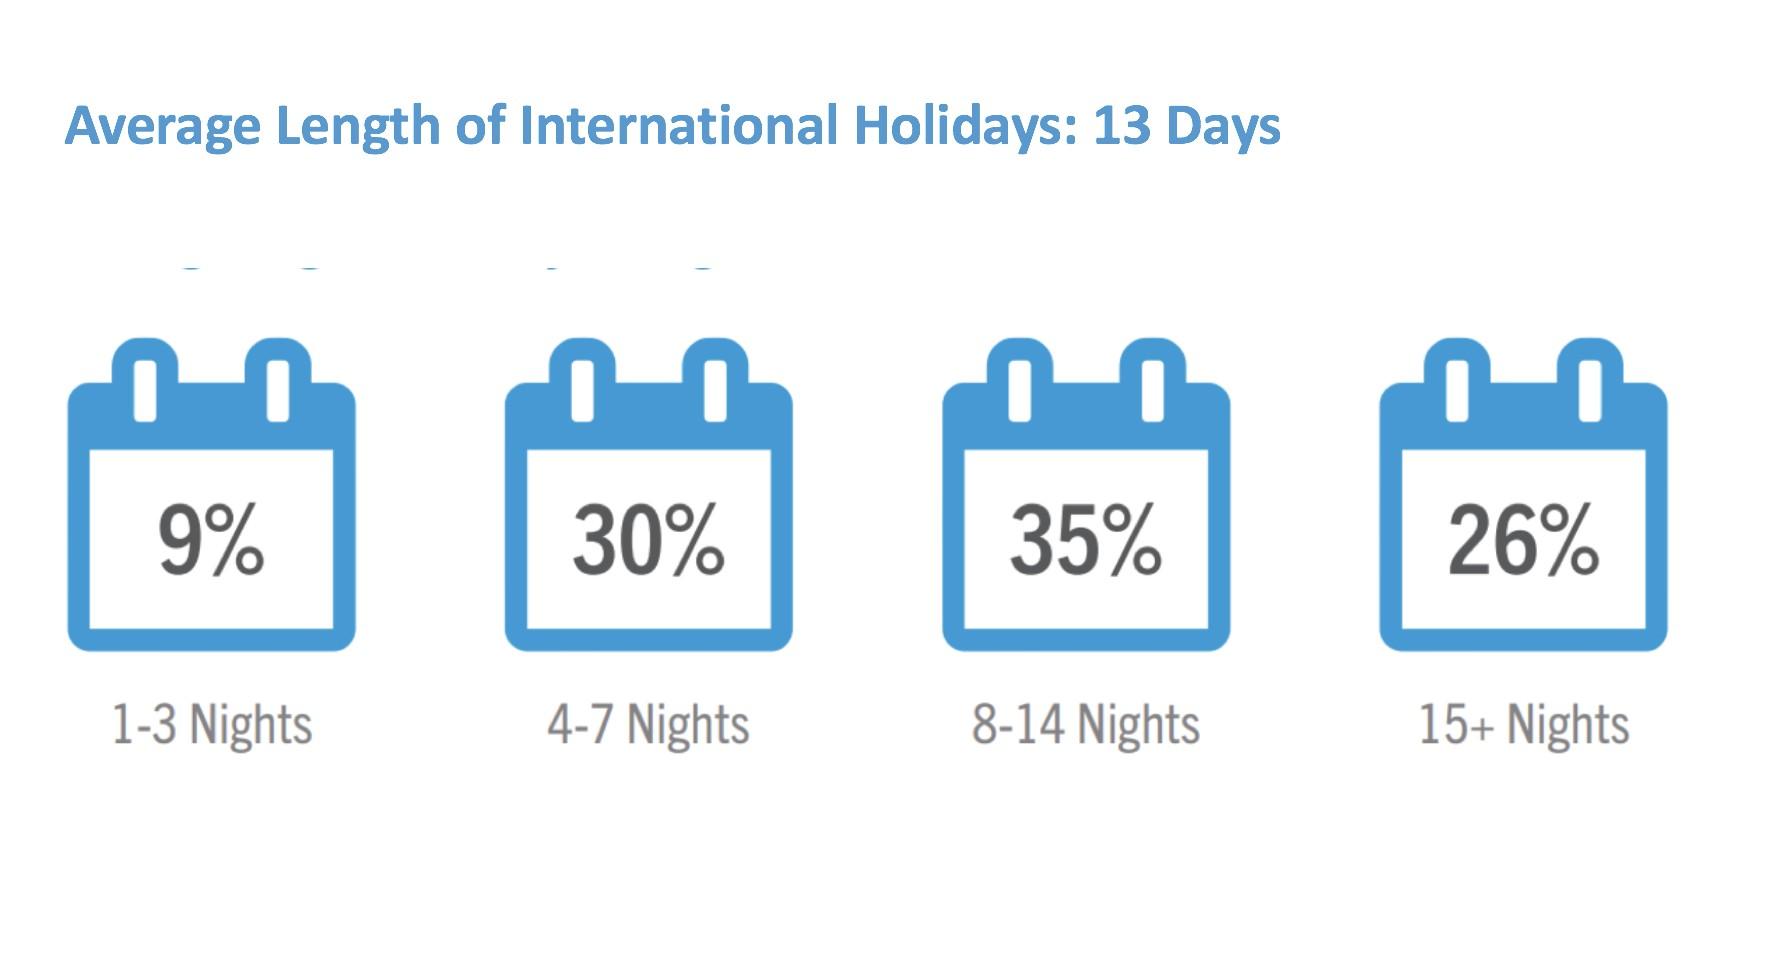 Length of International Holidays